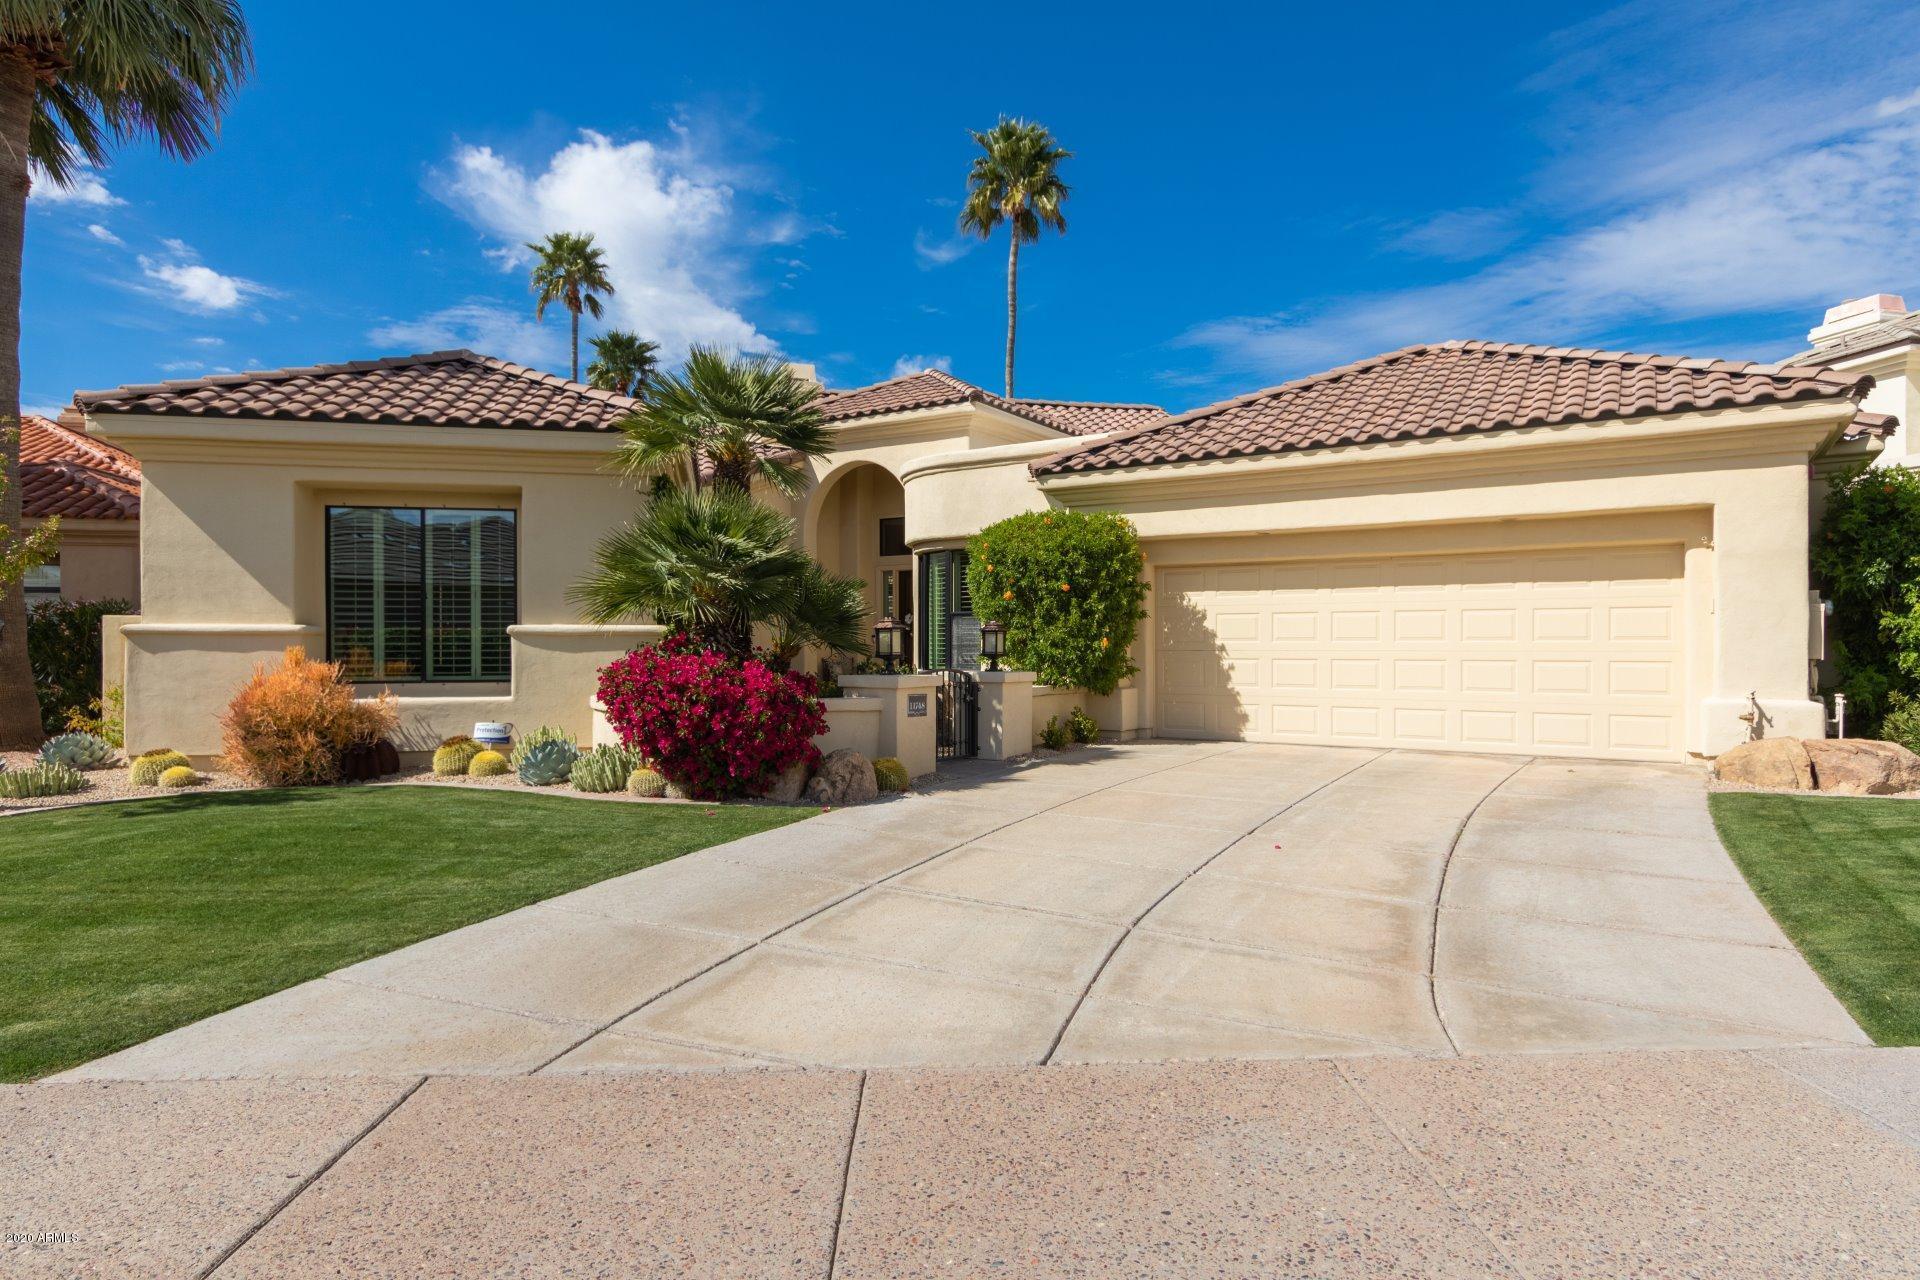 Photo of 11748 E DEL TIMBRE Drive, Scottsdale, AZ 85259